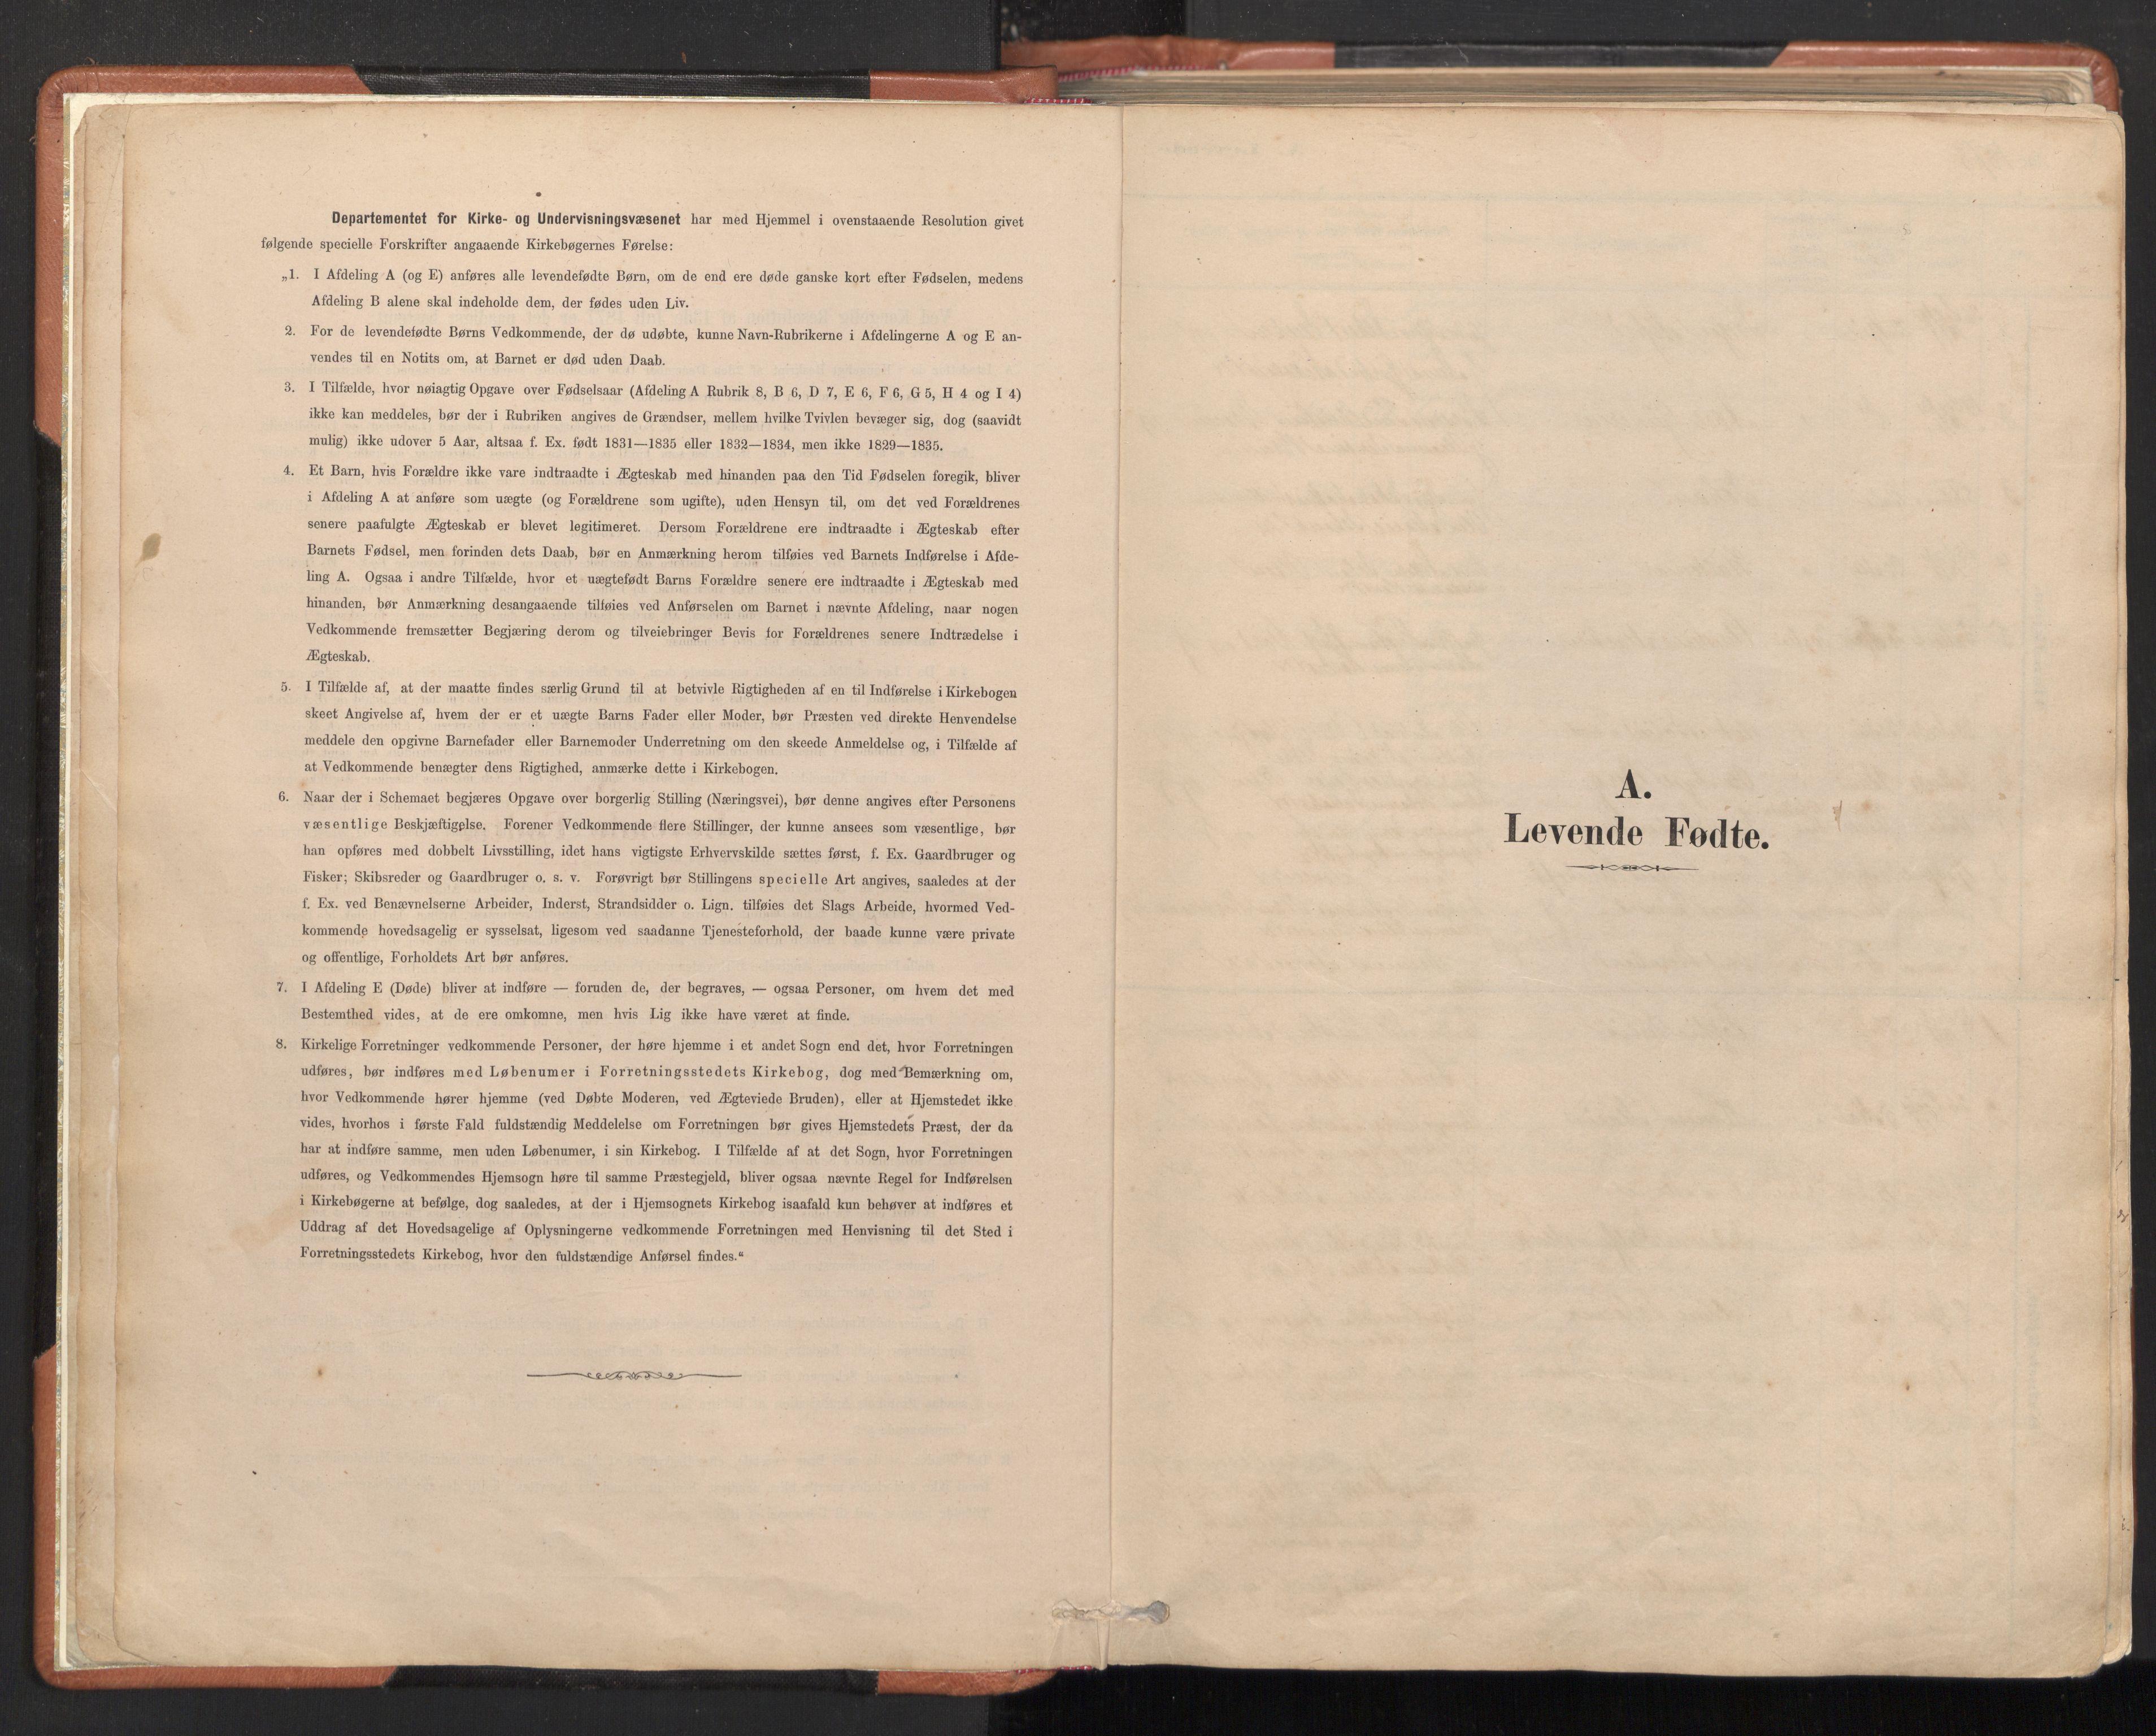 SAT, Ministerialprotokoller, klokkerbøker og fødselsregistre - Nordland, 817/L0264: Ministerialbok nr. 817A04, 1878-1907